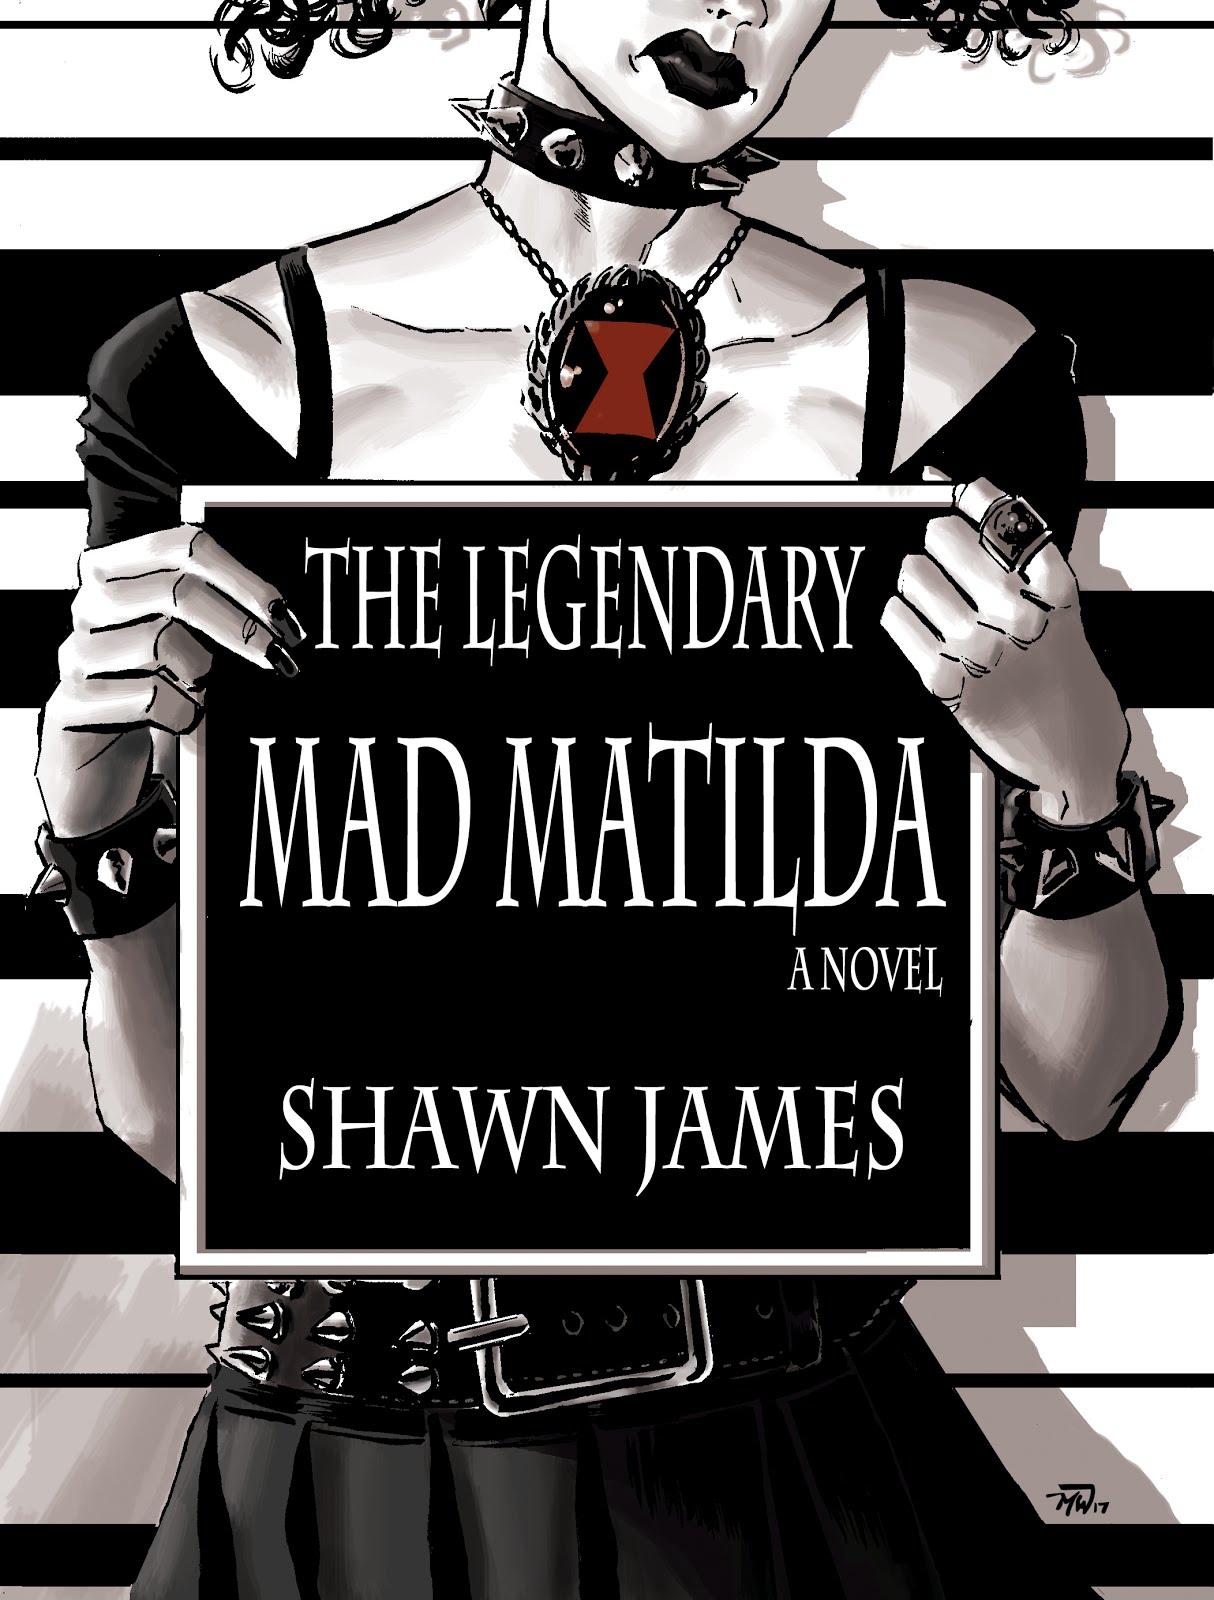 Shawn James, Black Freelance Writer: The Legendary Mad